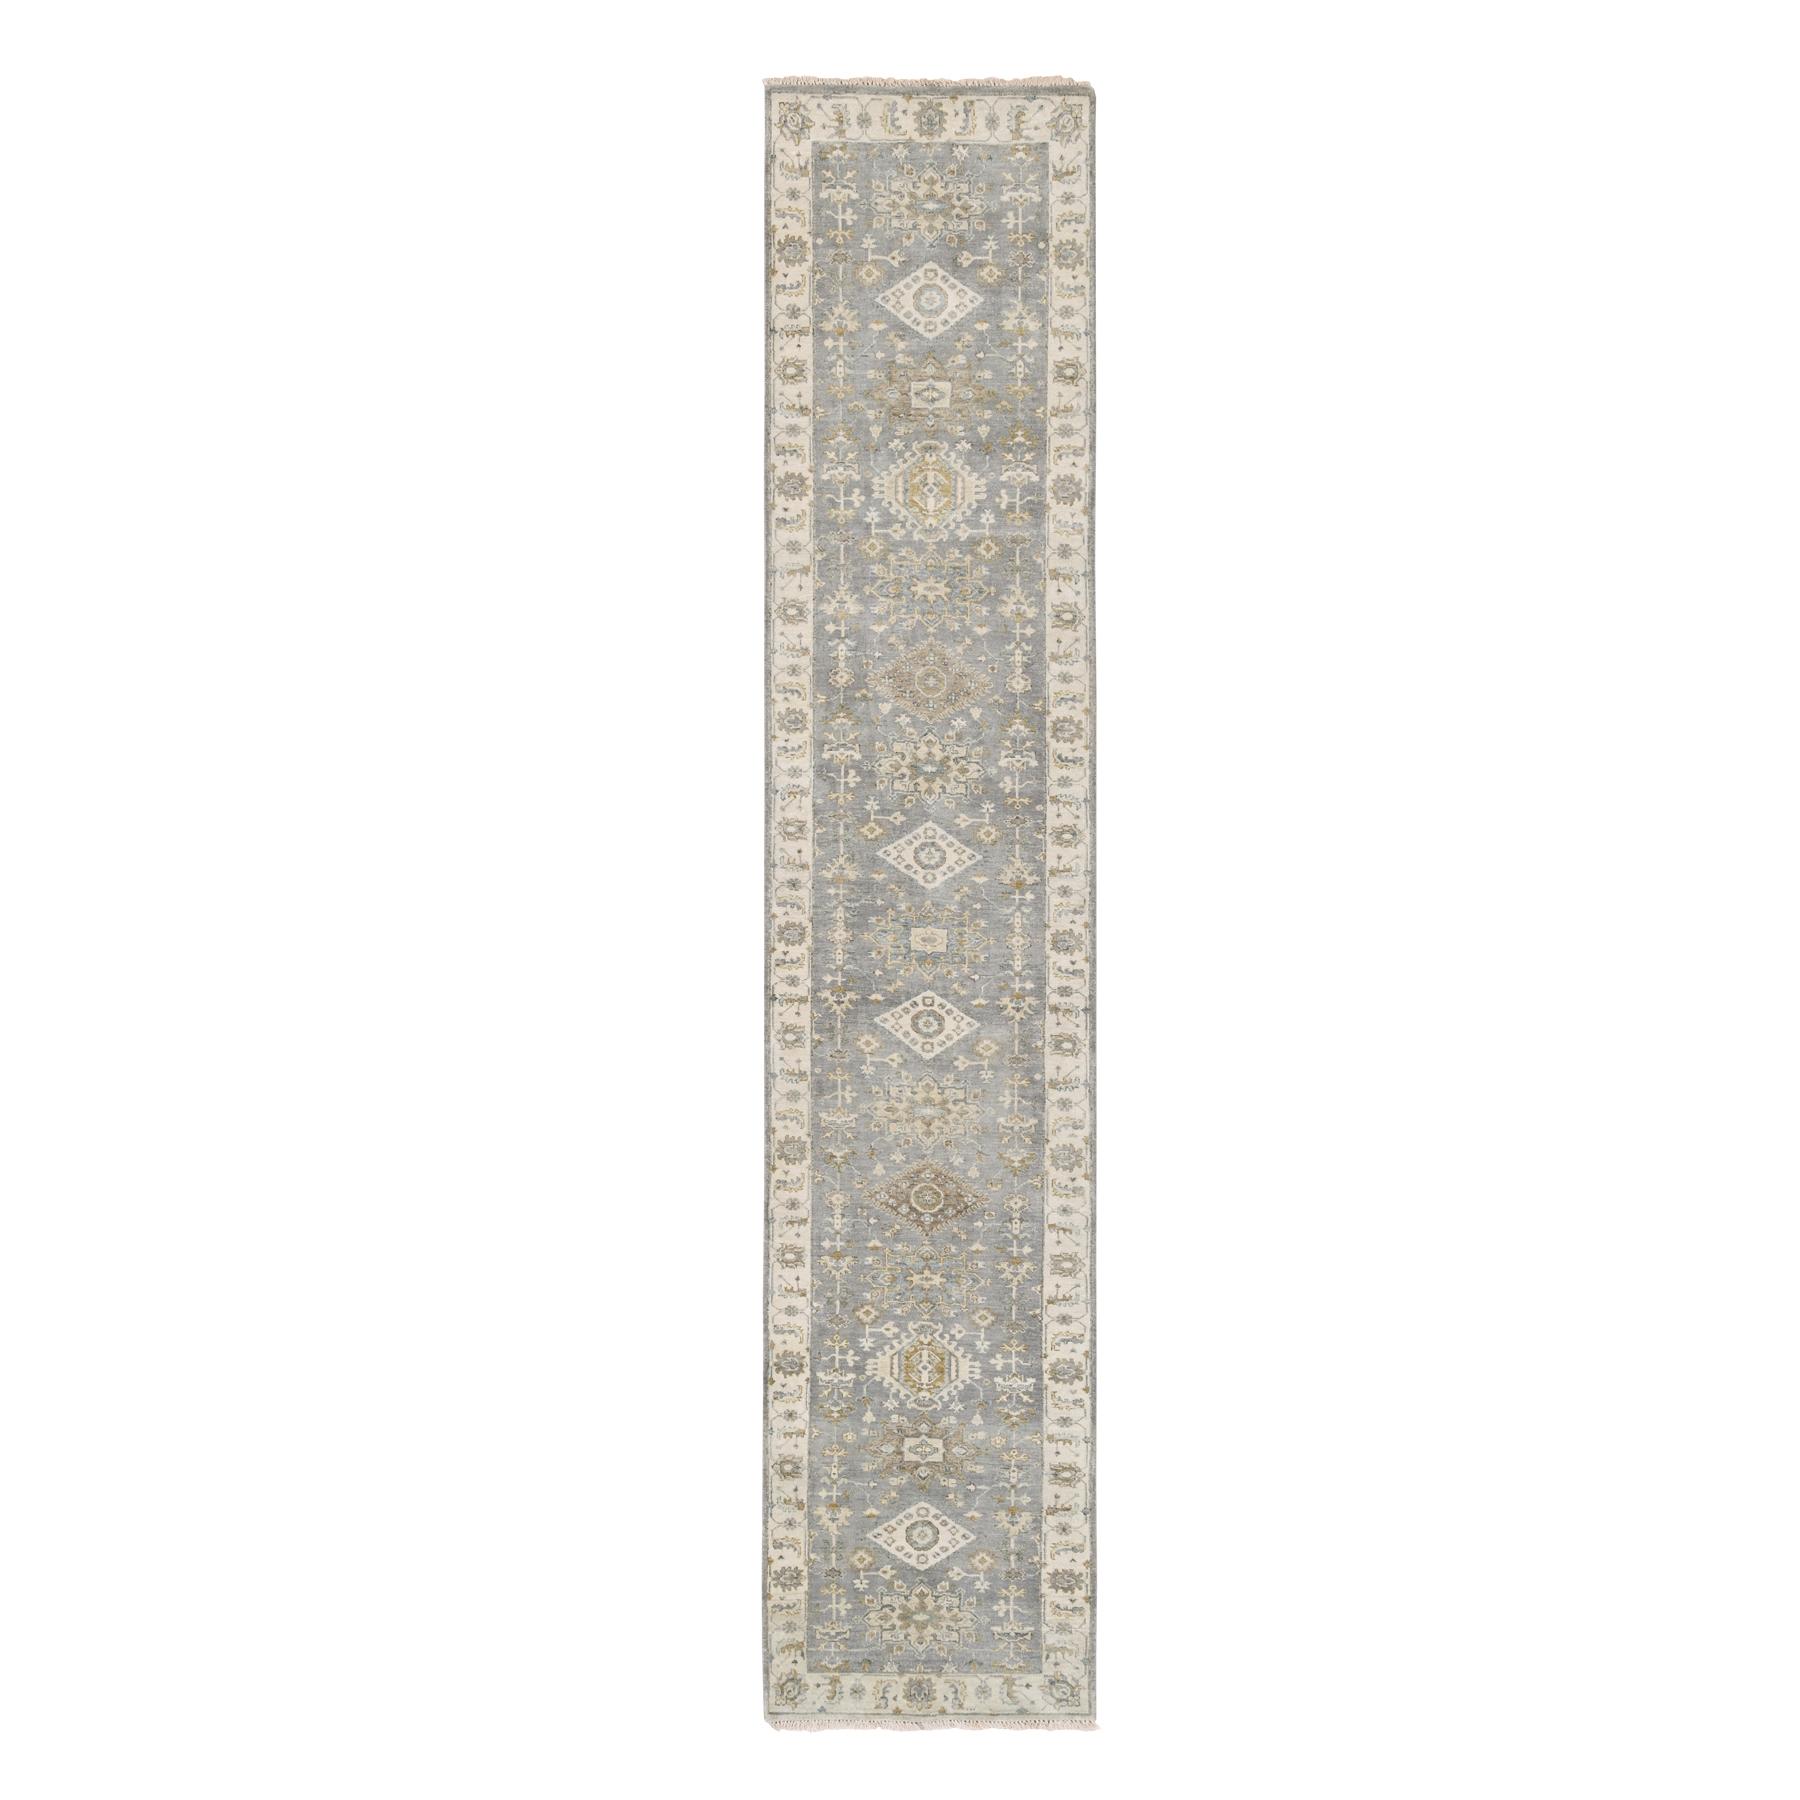 Serapi Heriz and Bakhshayesh Collection Hand Knotted Grey Rug No: 1124342